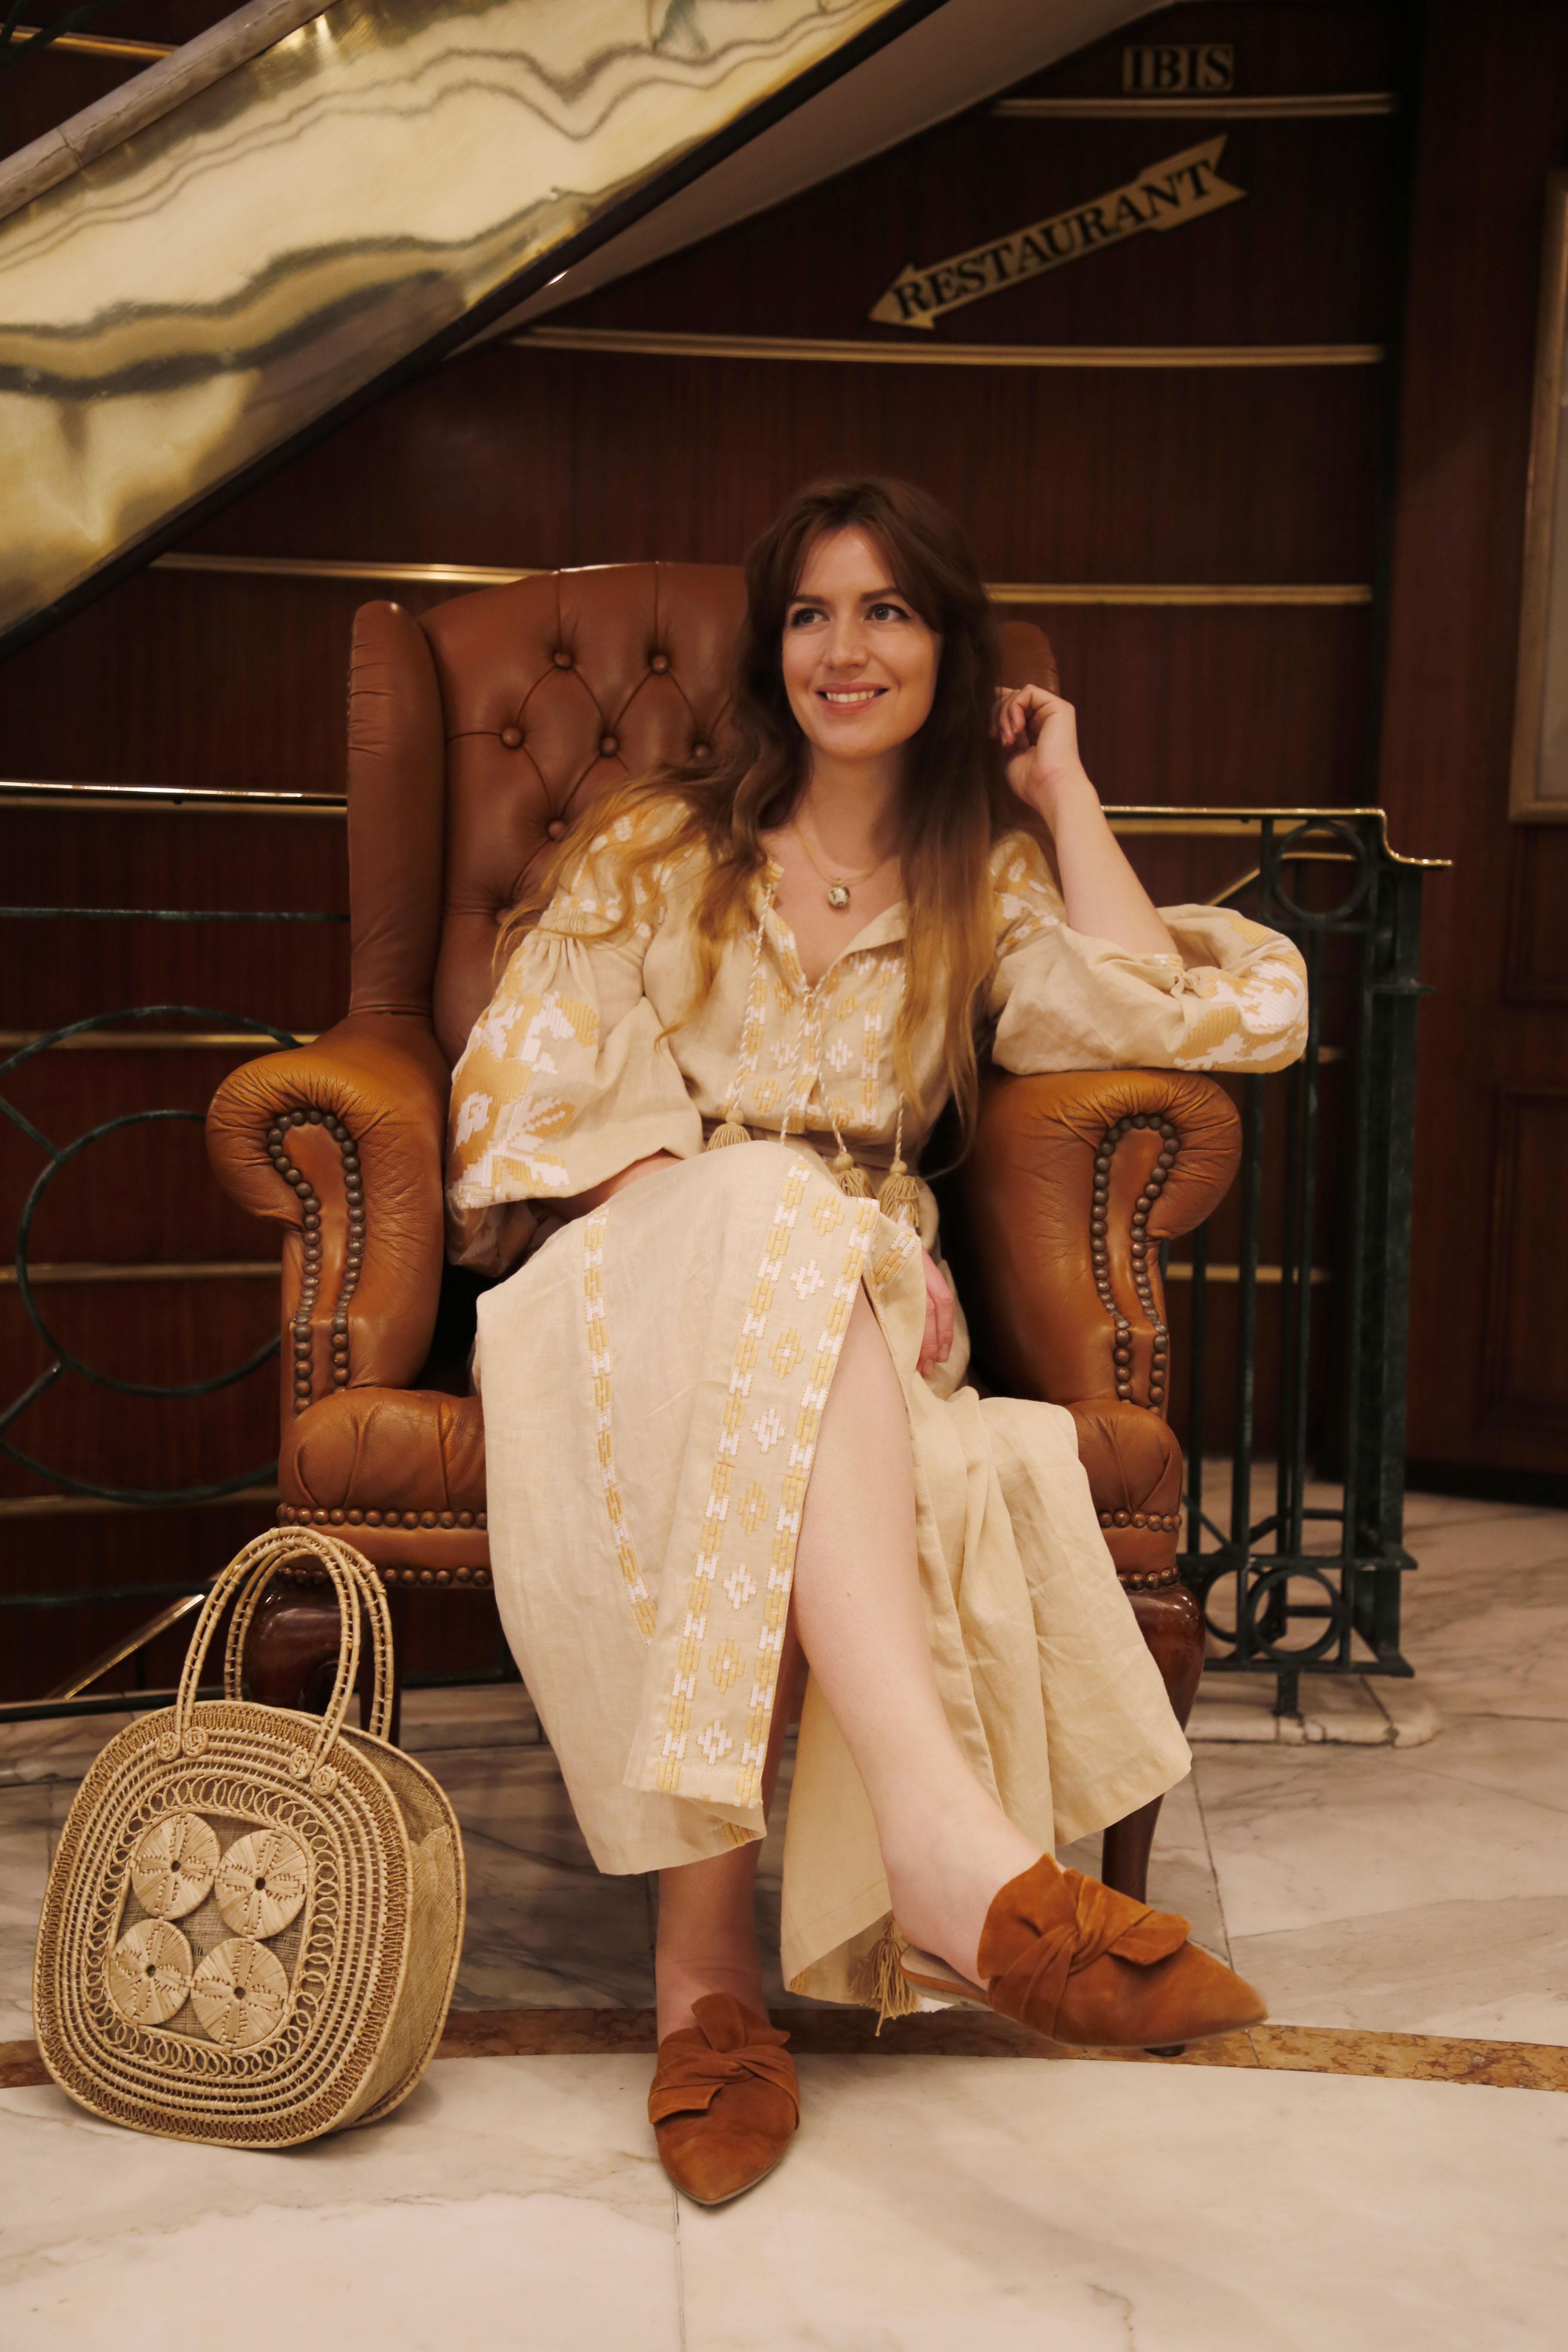 mia und ich blog Lady Sophia Nil Luxor Ägypten Egypt